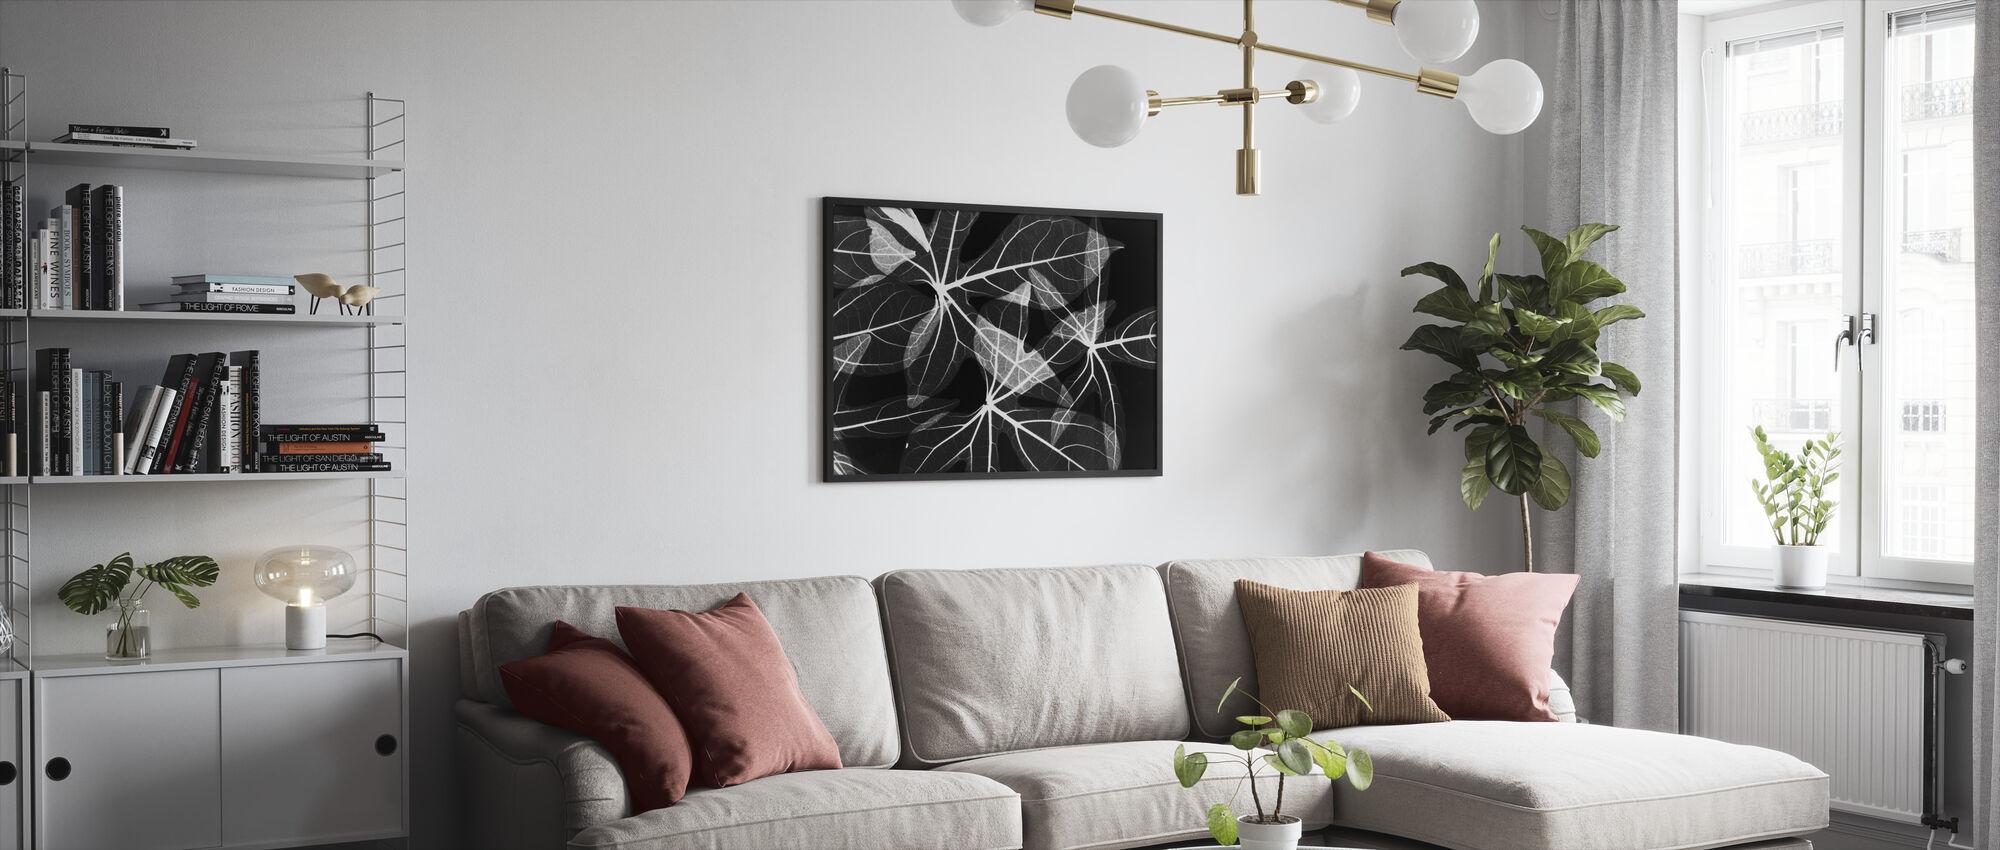 Löv - Inramad tavla - Vardagsrum